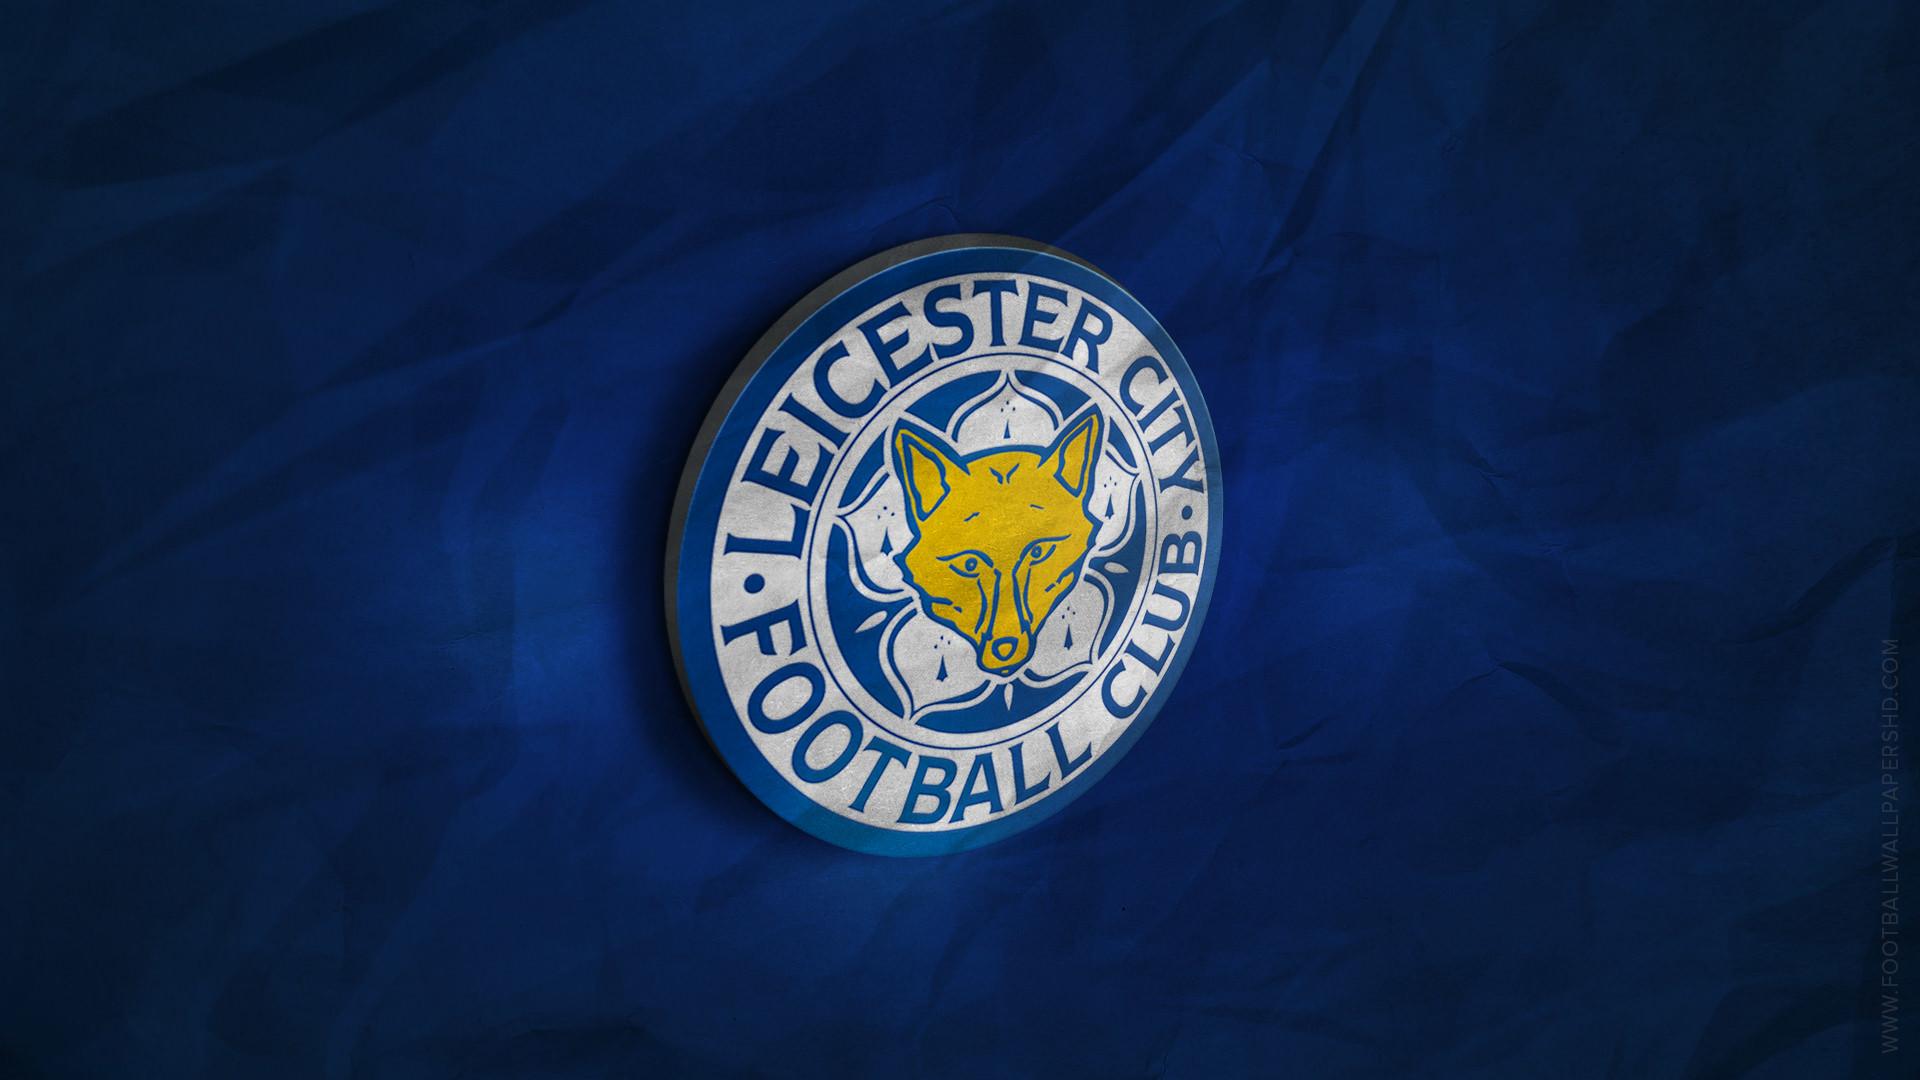 Leicester City 3D Logo Wallpaper